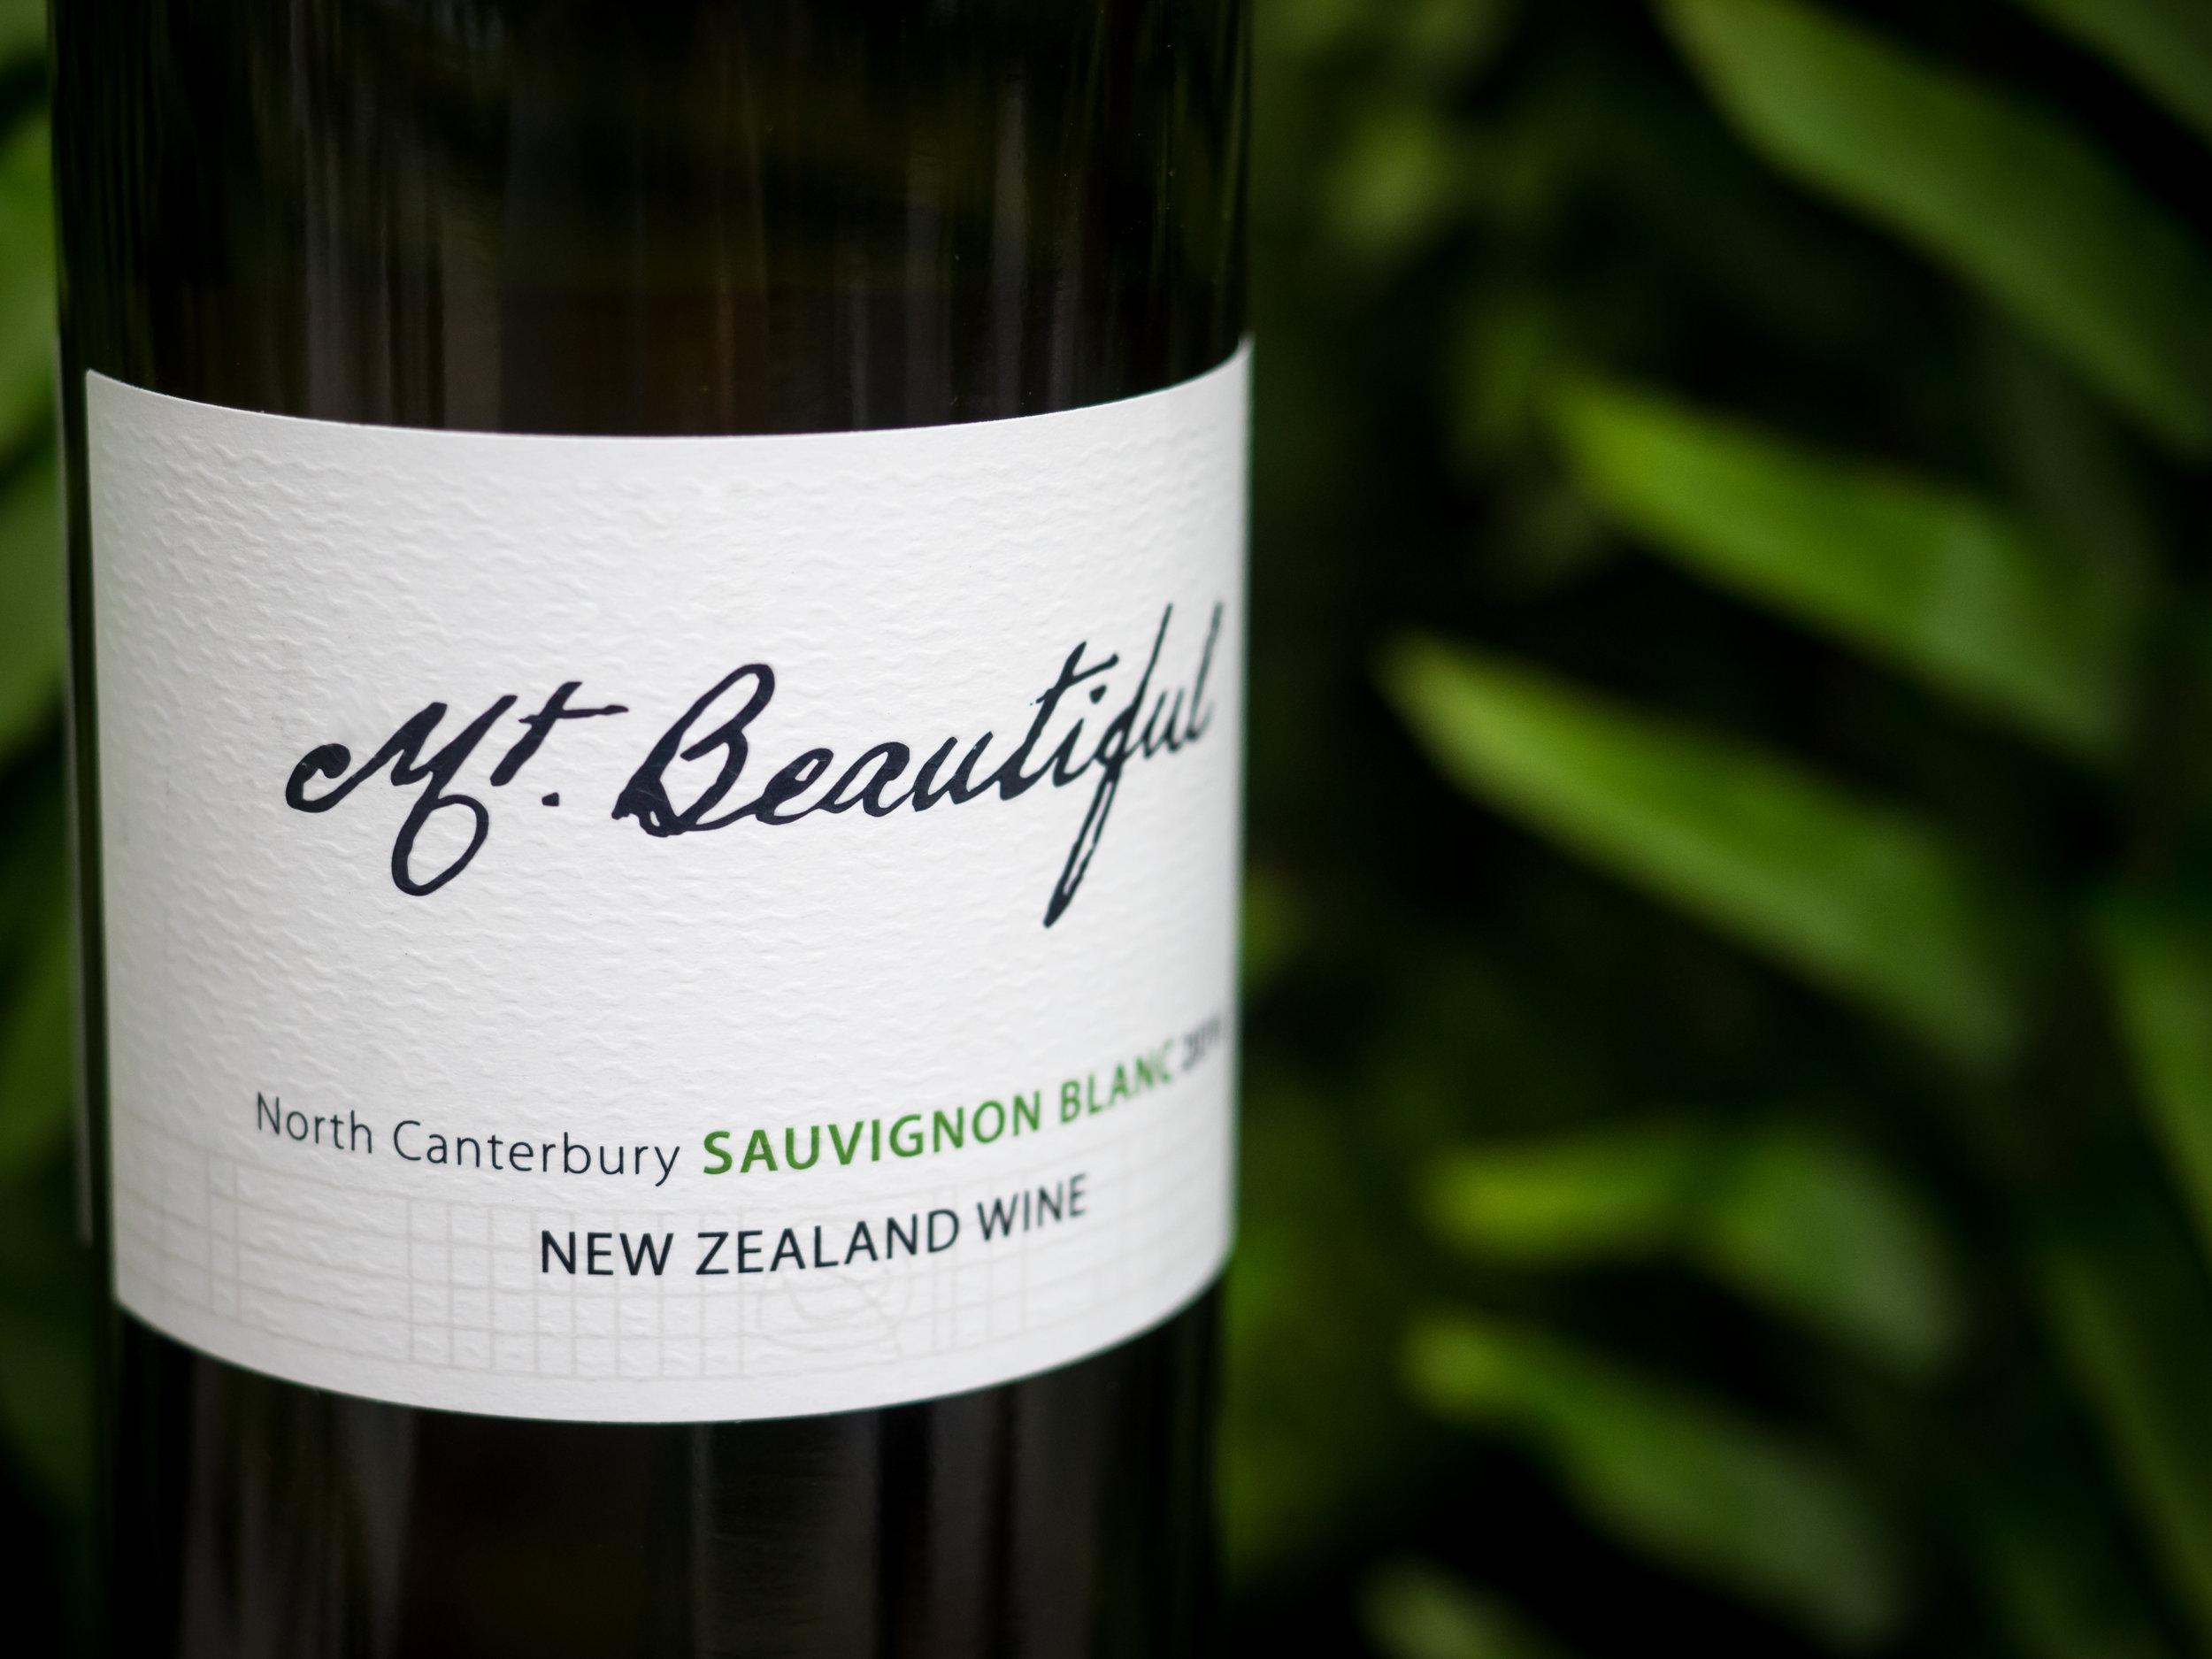 Musings by the Glass - The Pineapple-Kiwi Combination - Mt. Beautiful Sauvignon Blanc